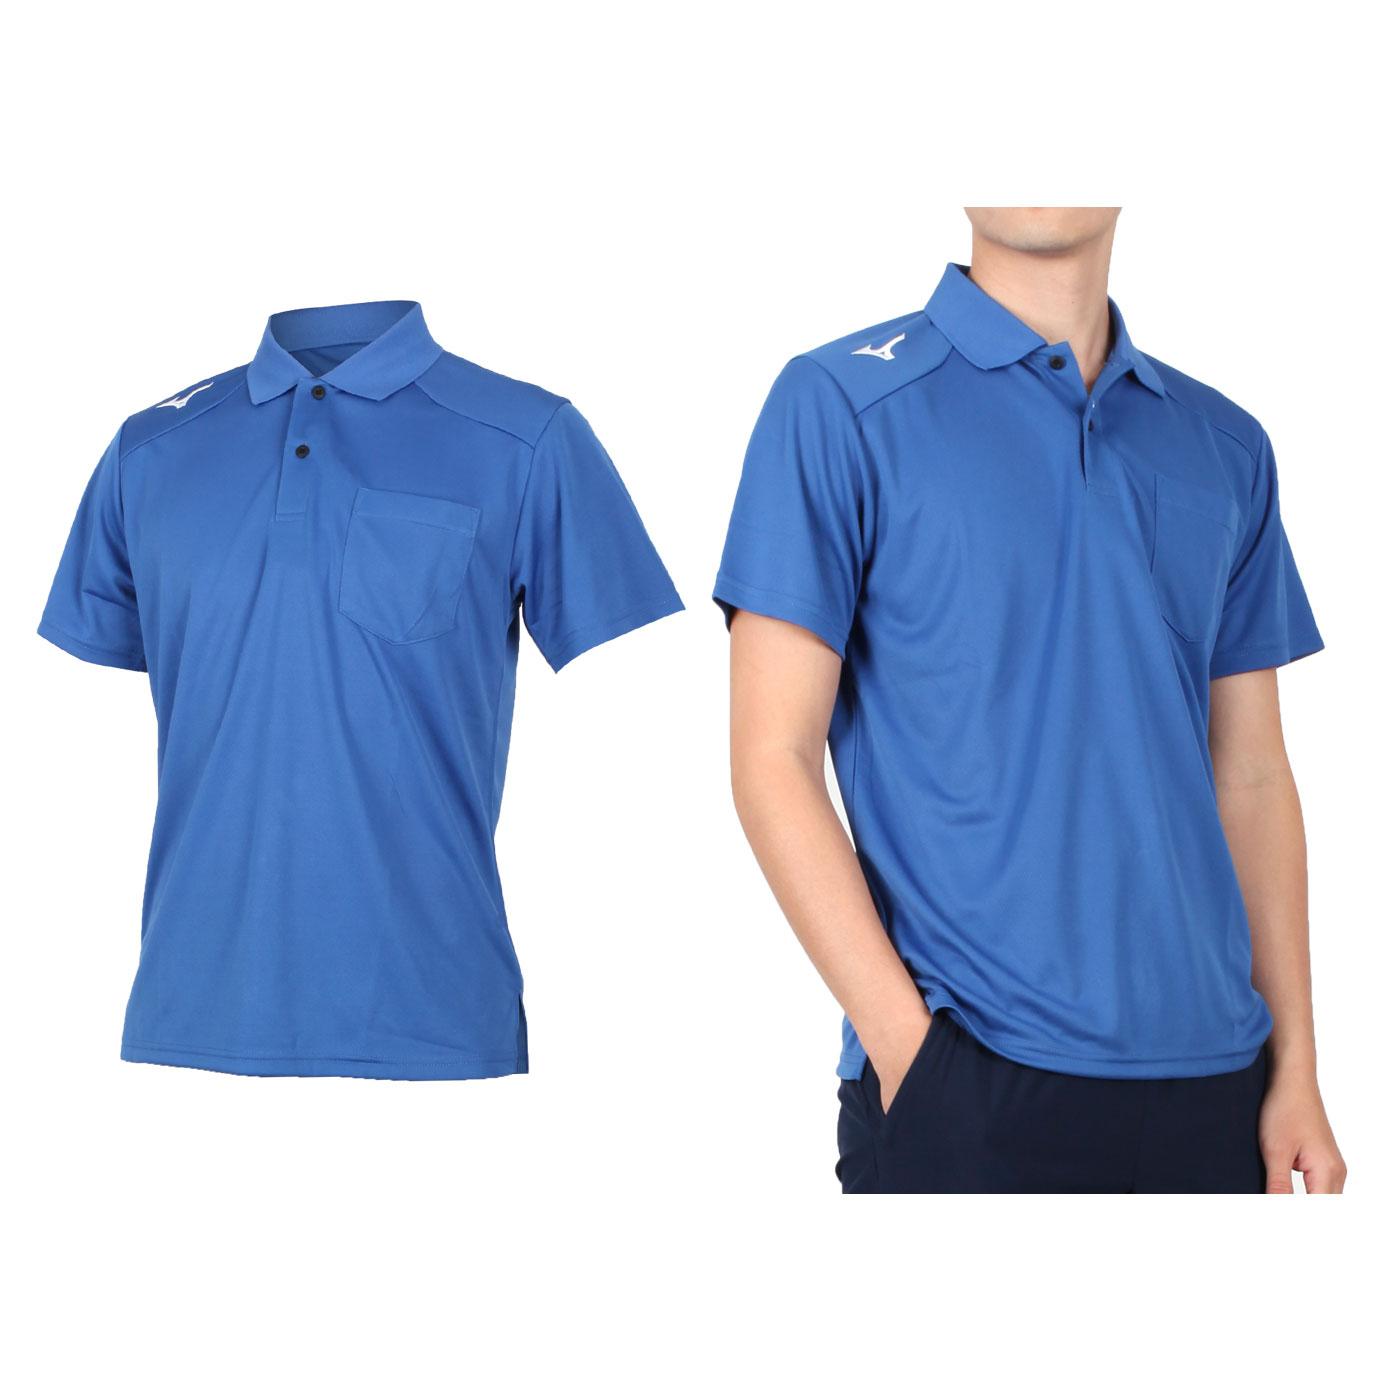 MIZUNO 男款短袖POLO衫 32TA002001 - 藍白